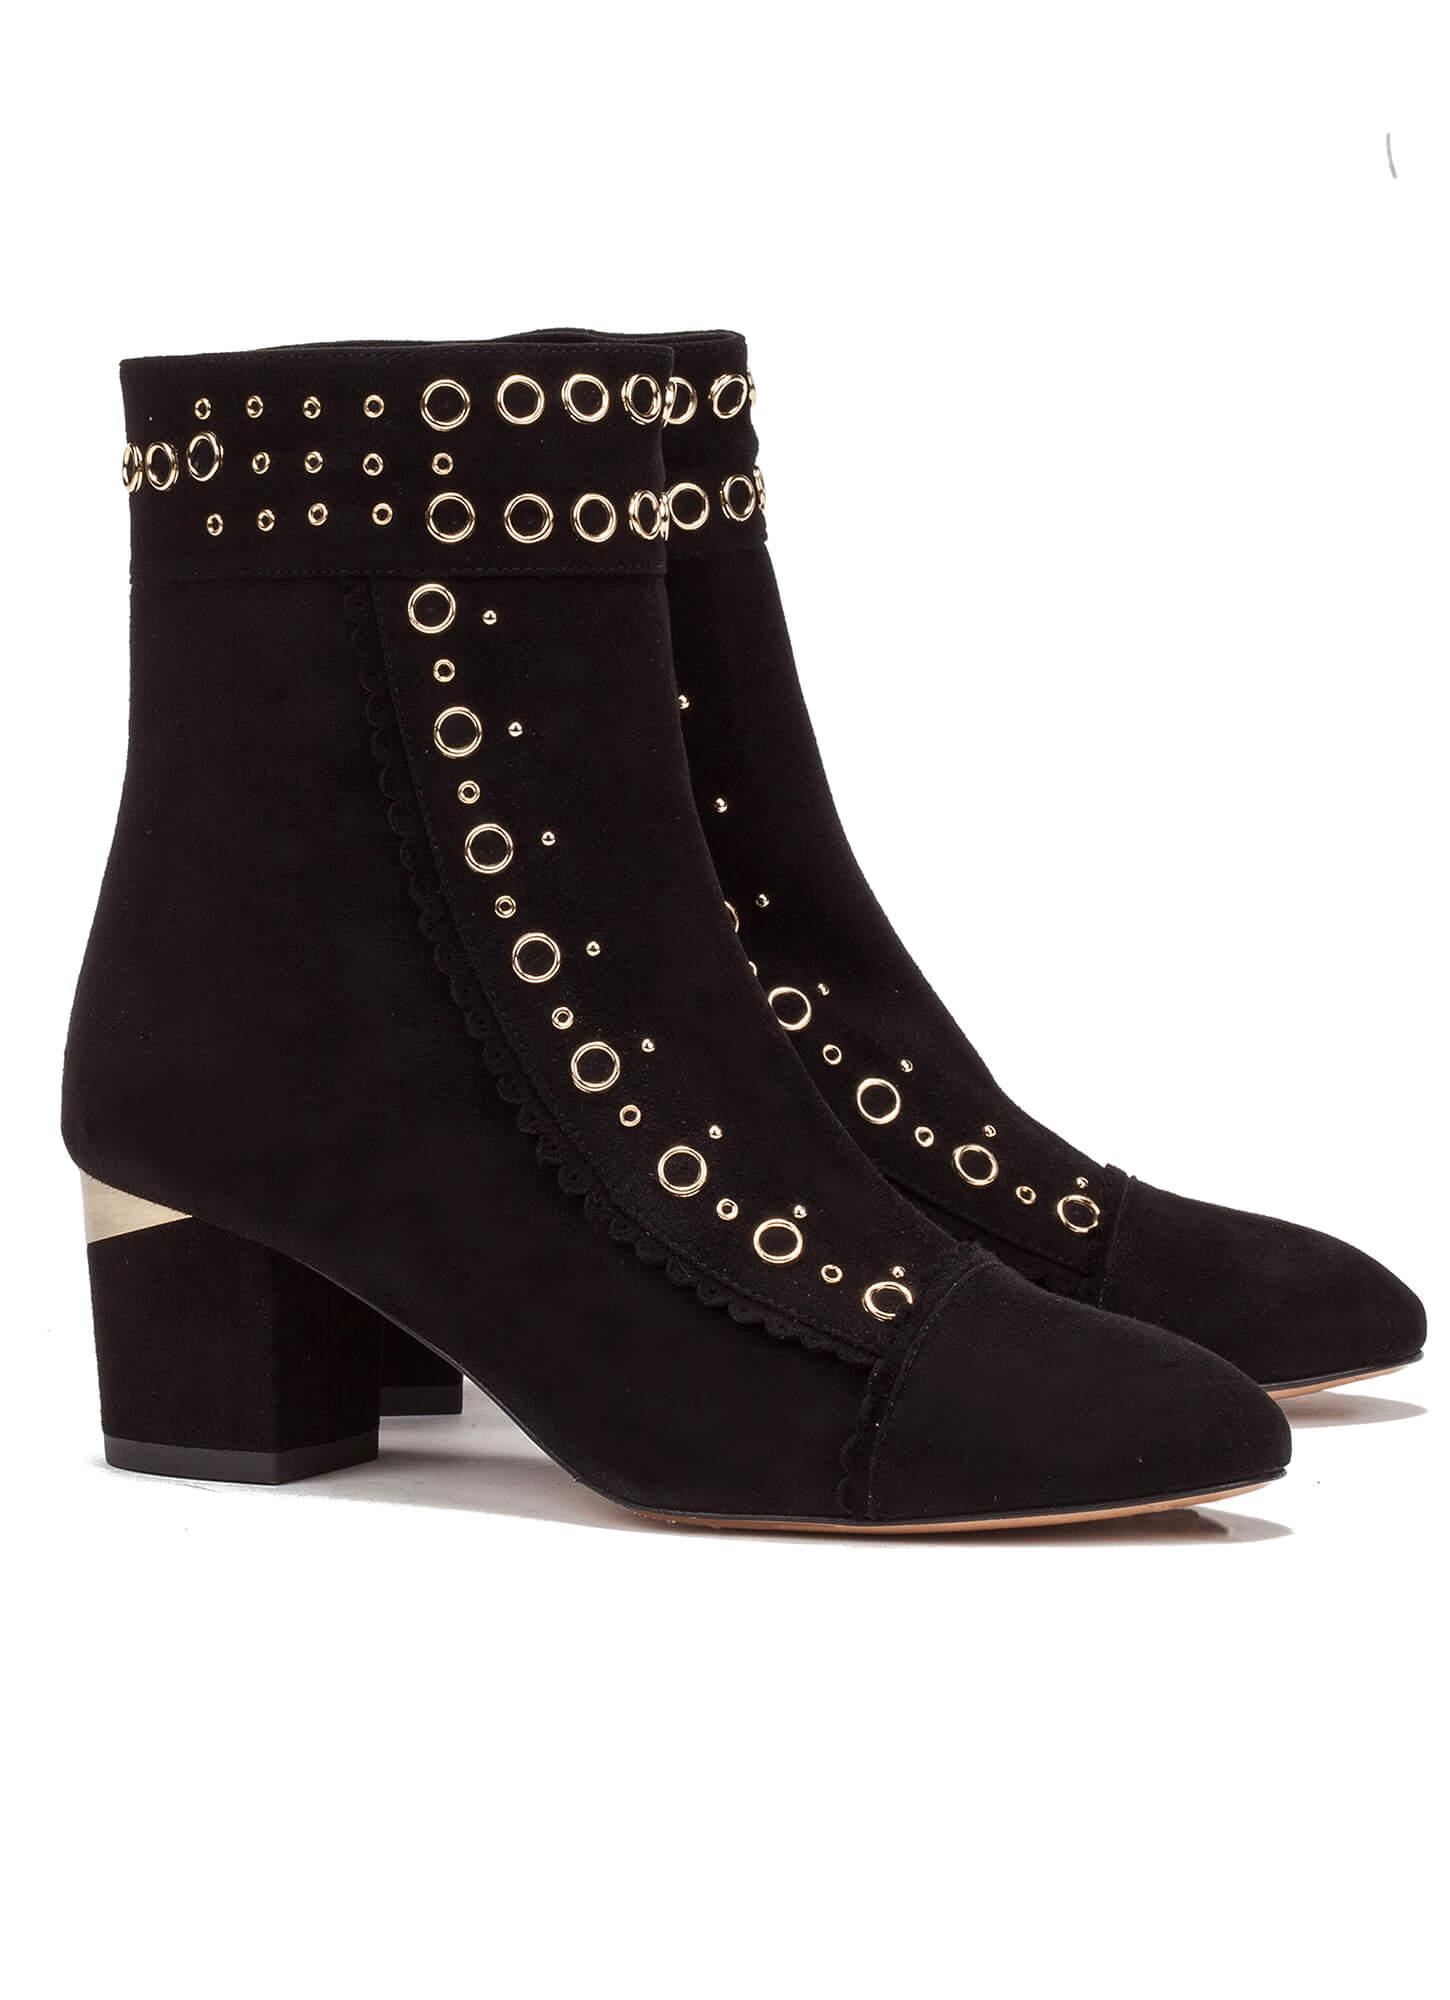 24d30e3927bd0 Mid heel ankle boot in black suede - online shoe store Pura Lopez ...